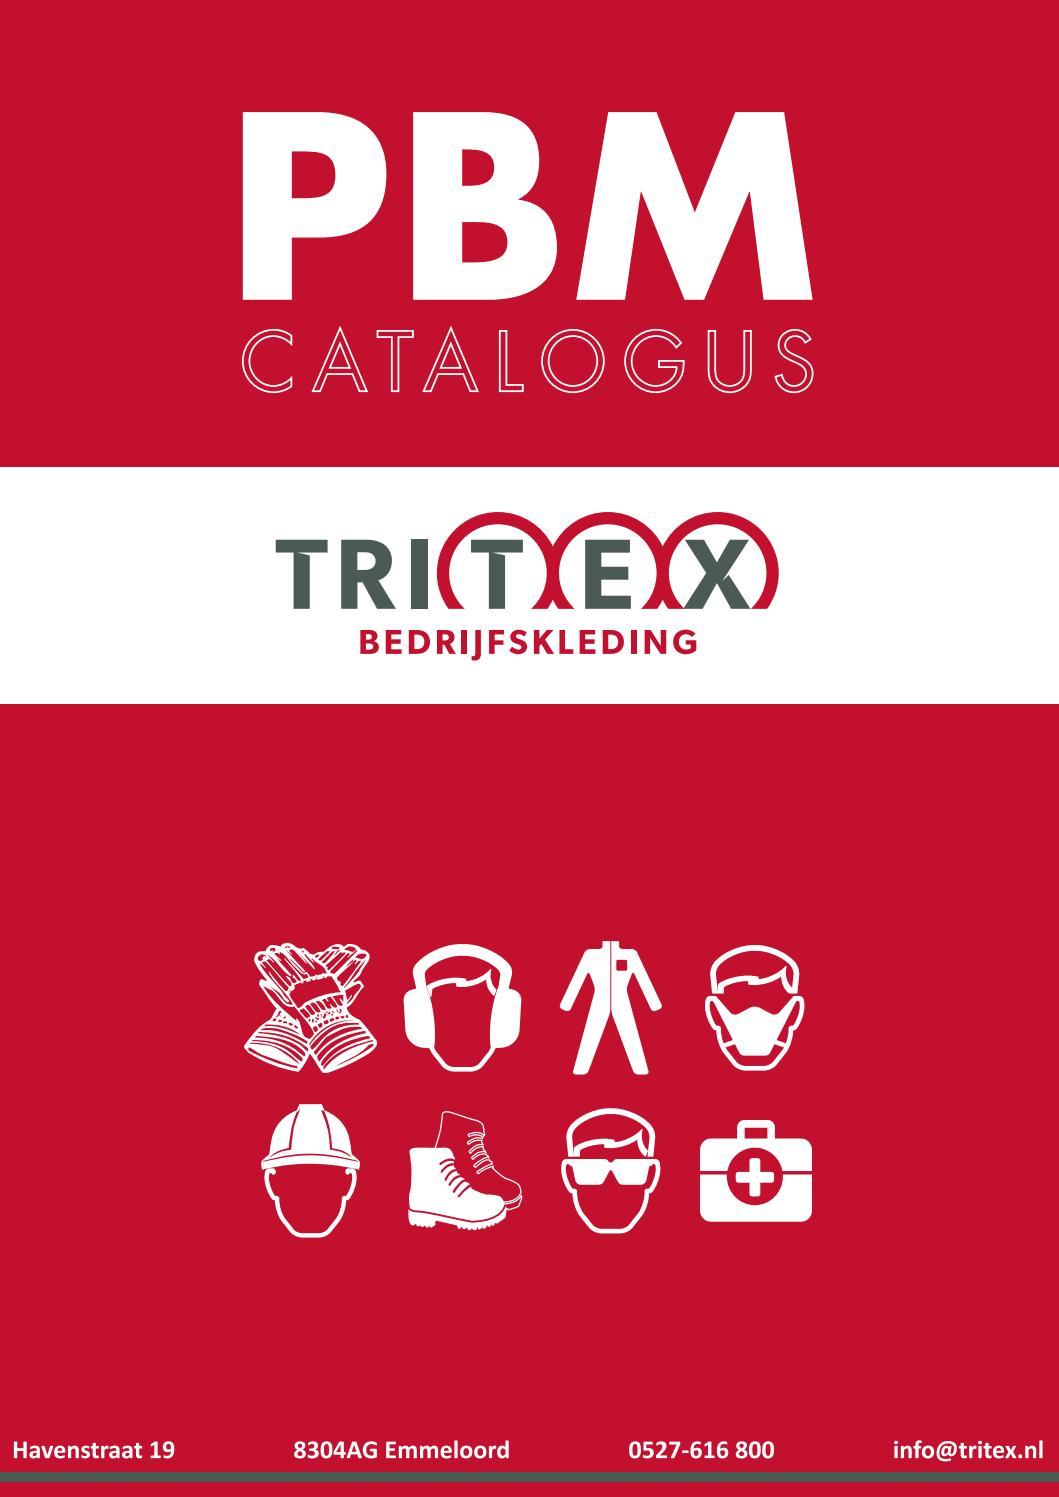 802880280ca PBM Catalogus Tritex by Majestic Products B.V. - issuu